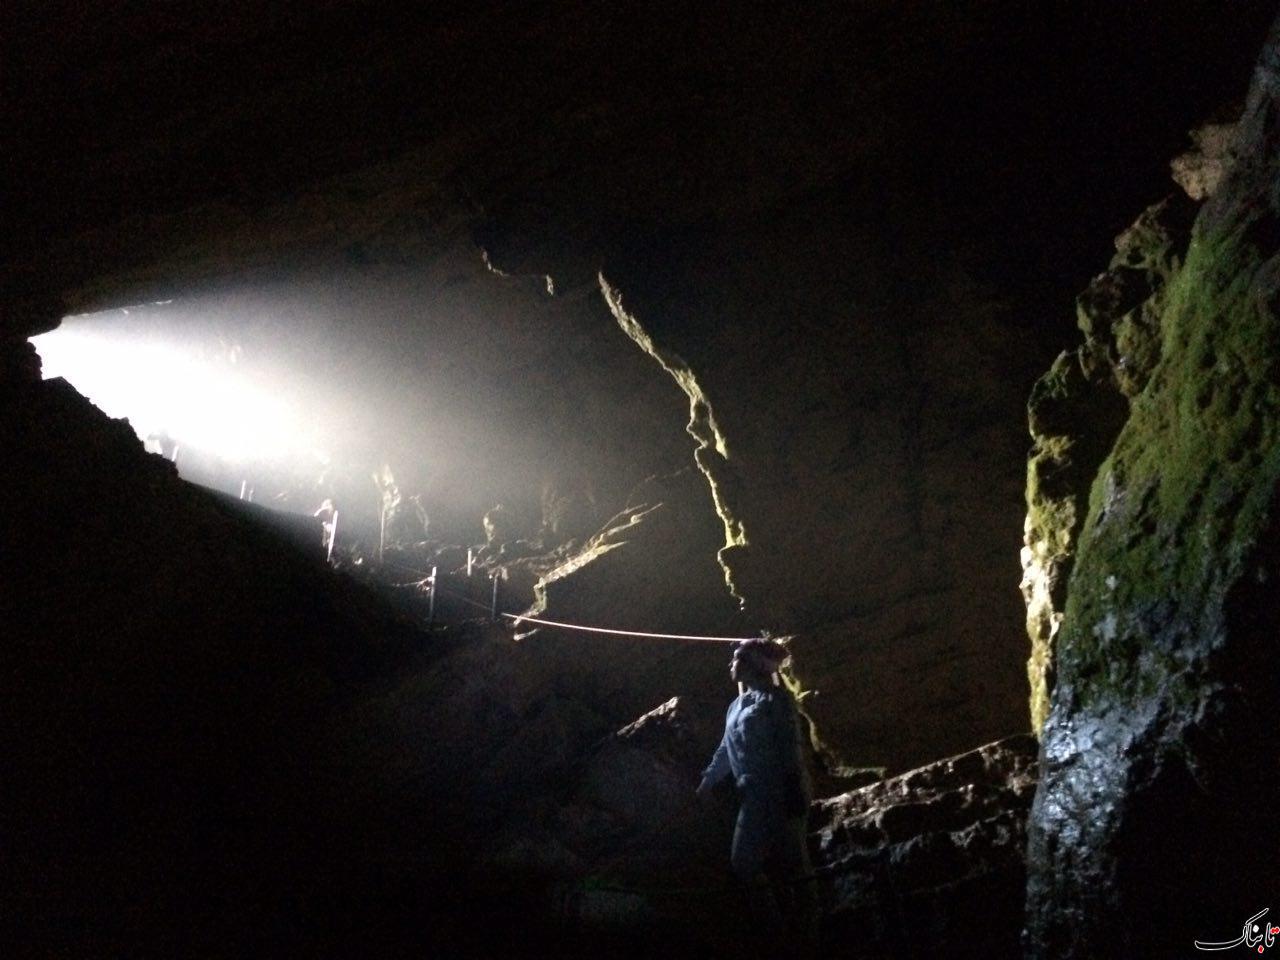 غار بورنيك، فيروز كوه